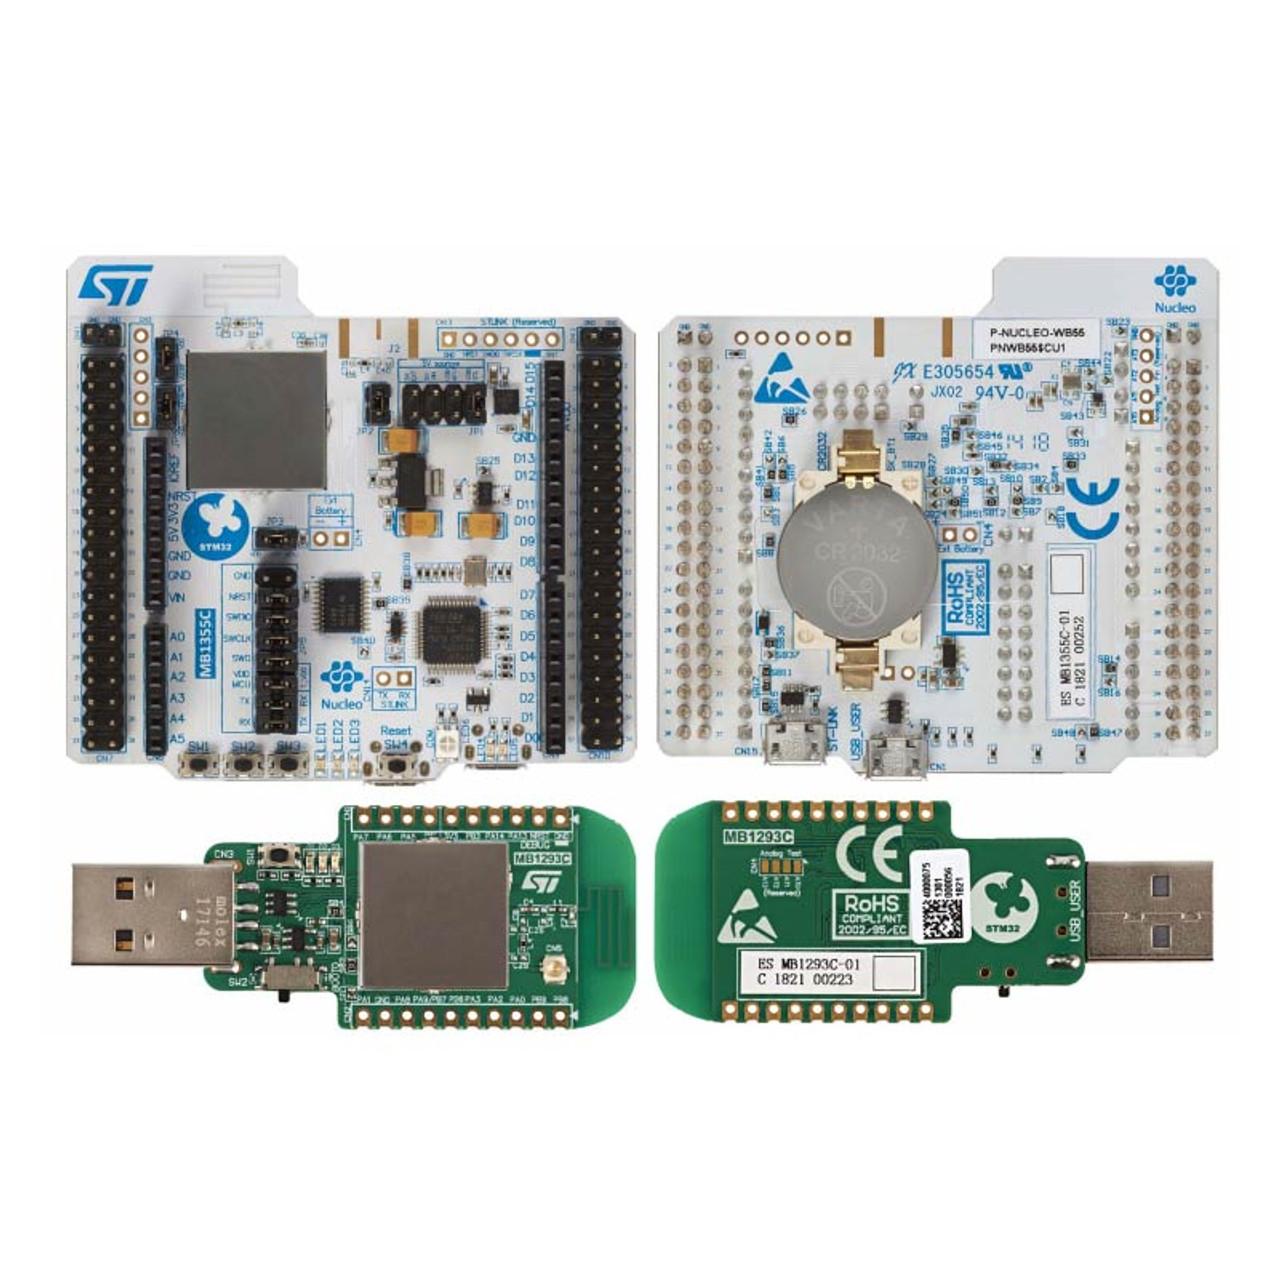 Bluetooth 5, 802 15 4 Nucleo Pack USB dongle Nucleo-68 STM32WB55 MCU RF  Evaluation Board